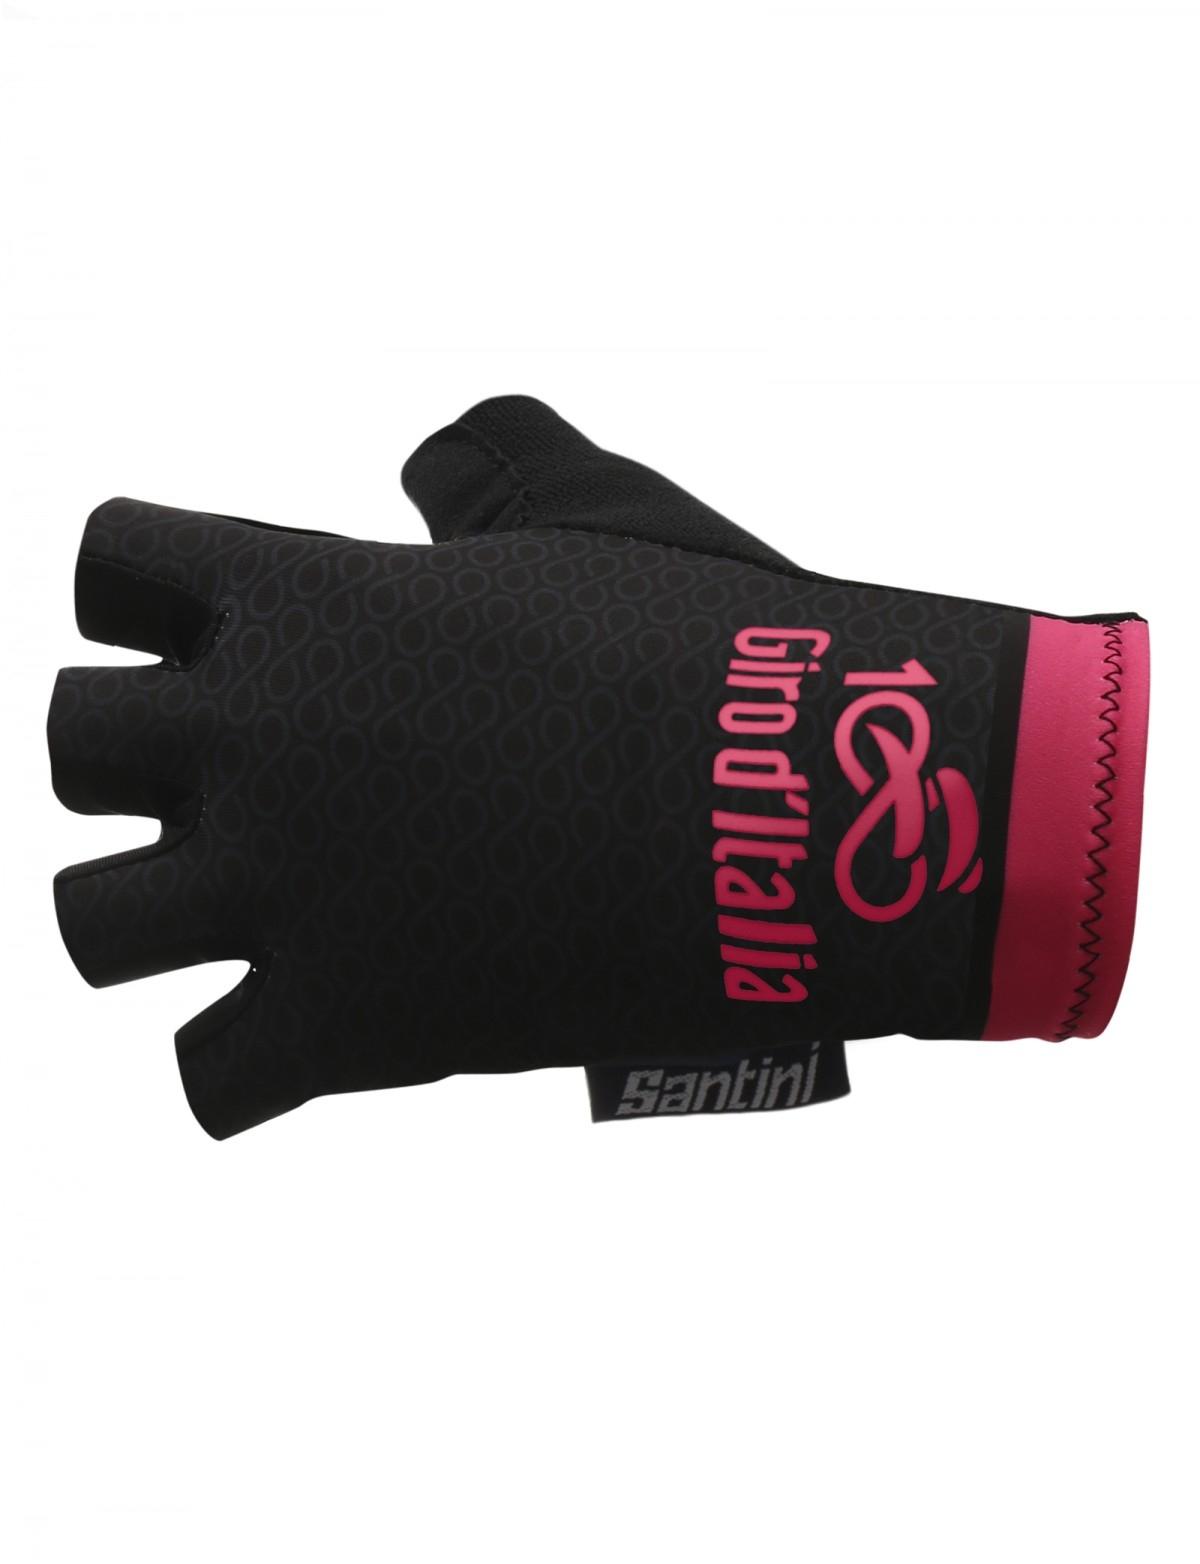 SANTINI MAGLIA NERA - Summer Gloves- ποδηλατικά γάντια - Δαλαβίκας bikes 2ee99c75fb9